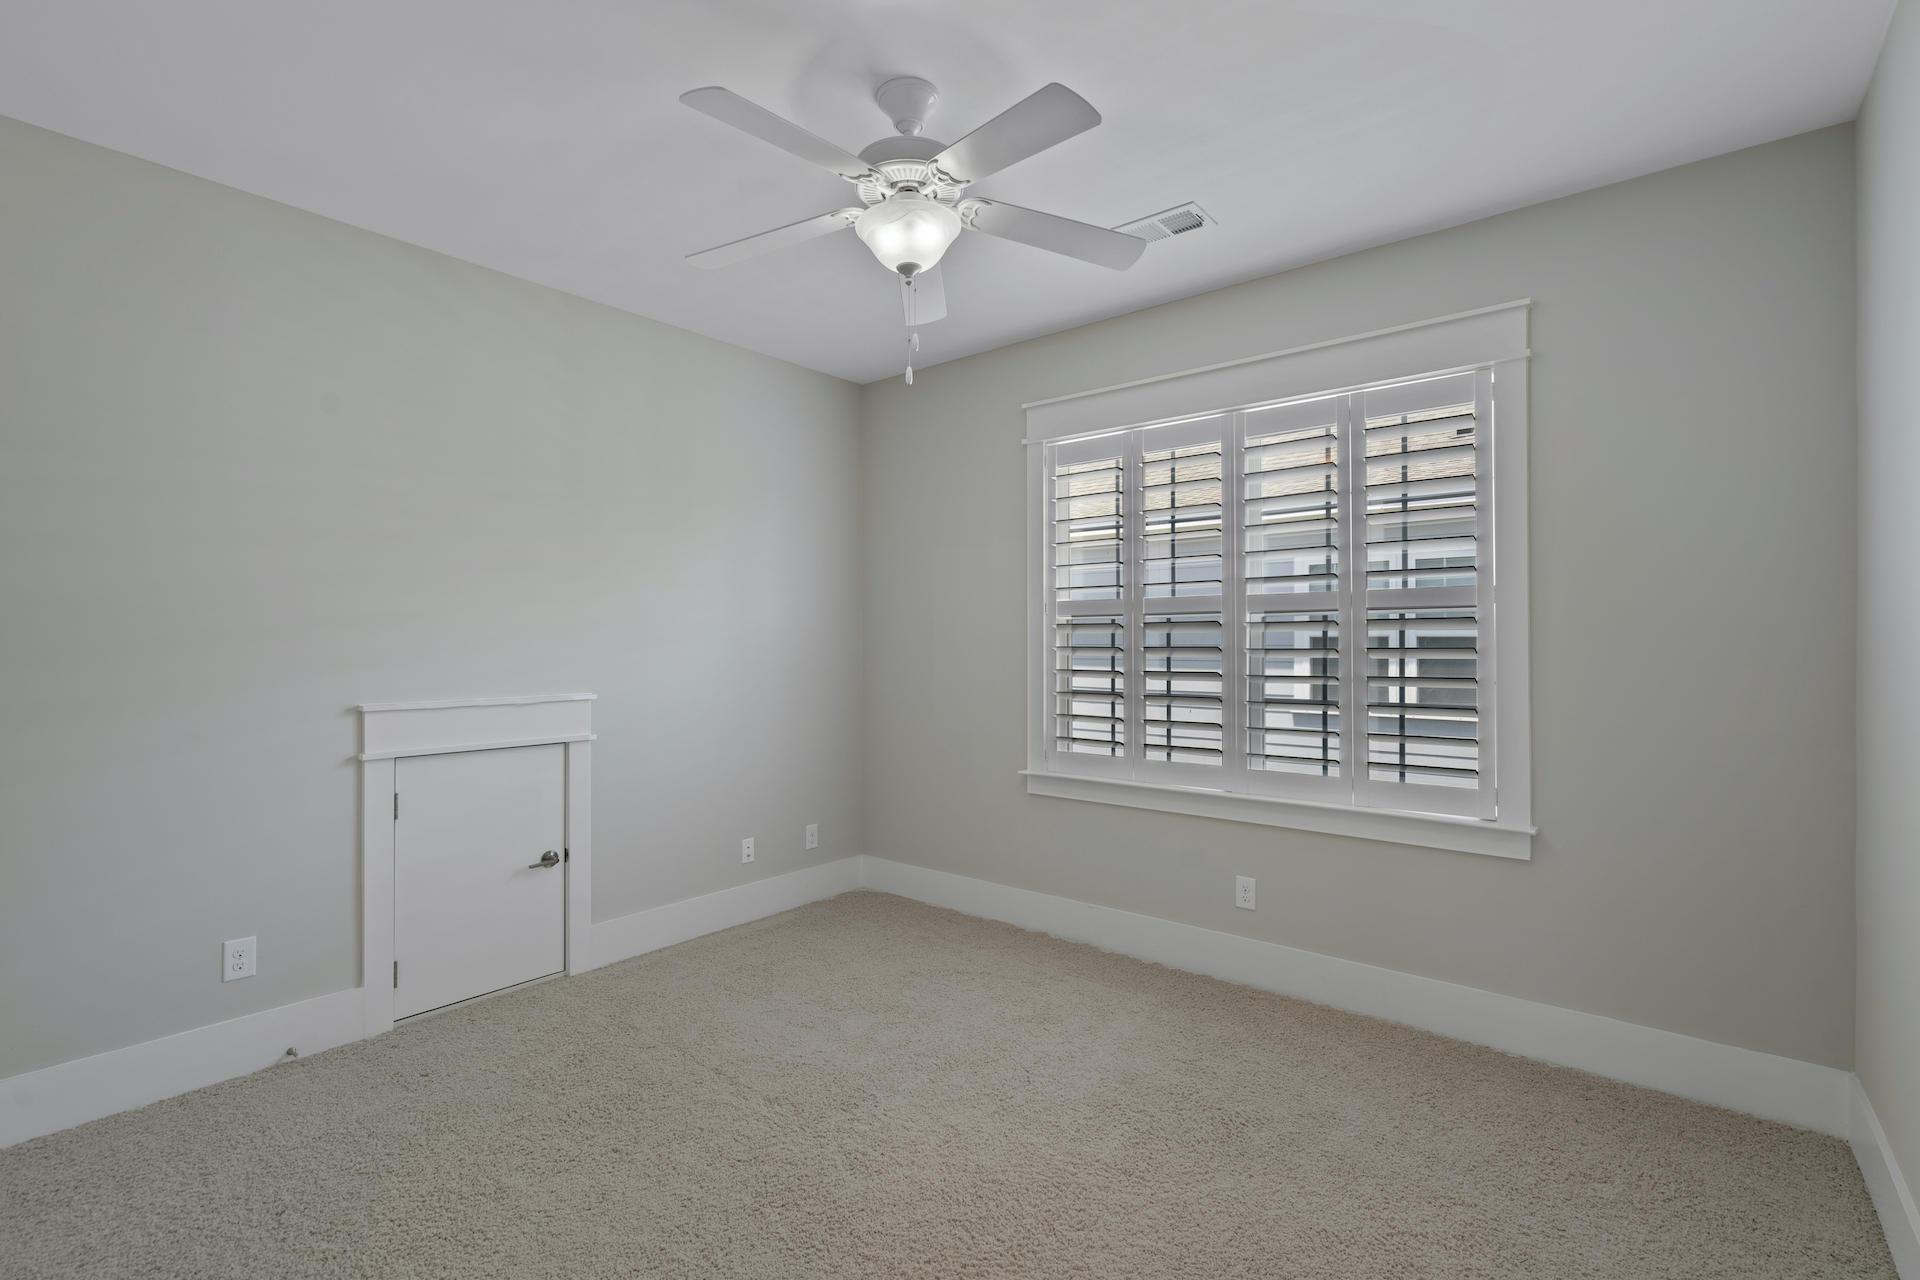 Dunes West Homes For Sale - 2316 Bucktail, Mount Pleasant, SC - 7